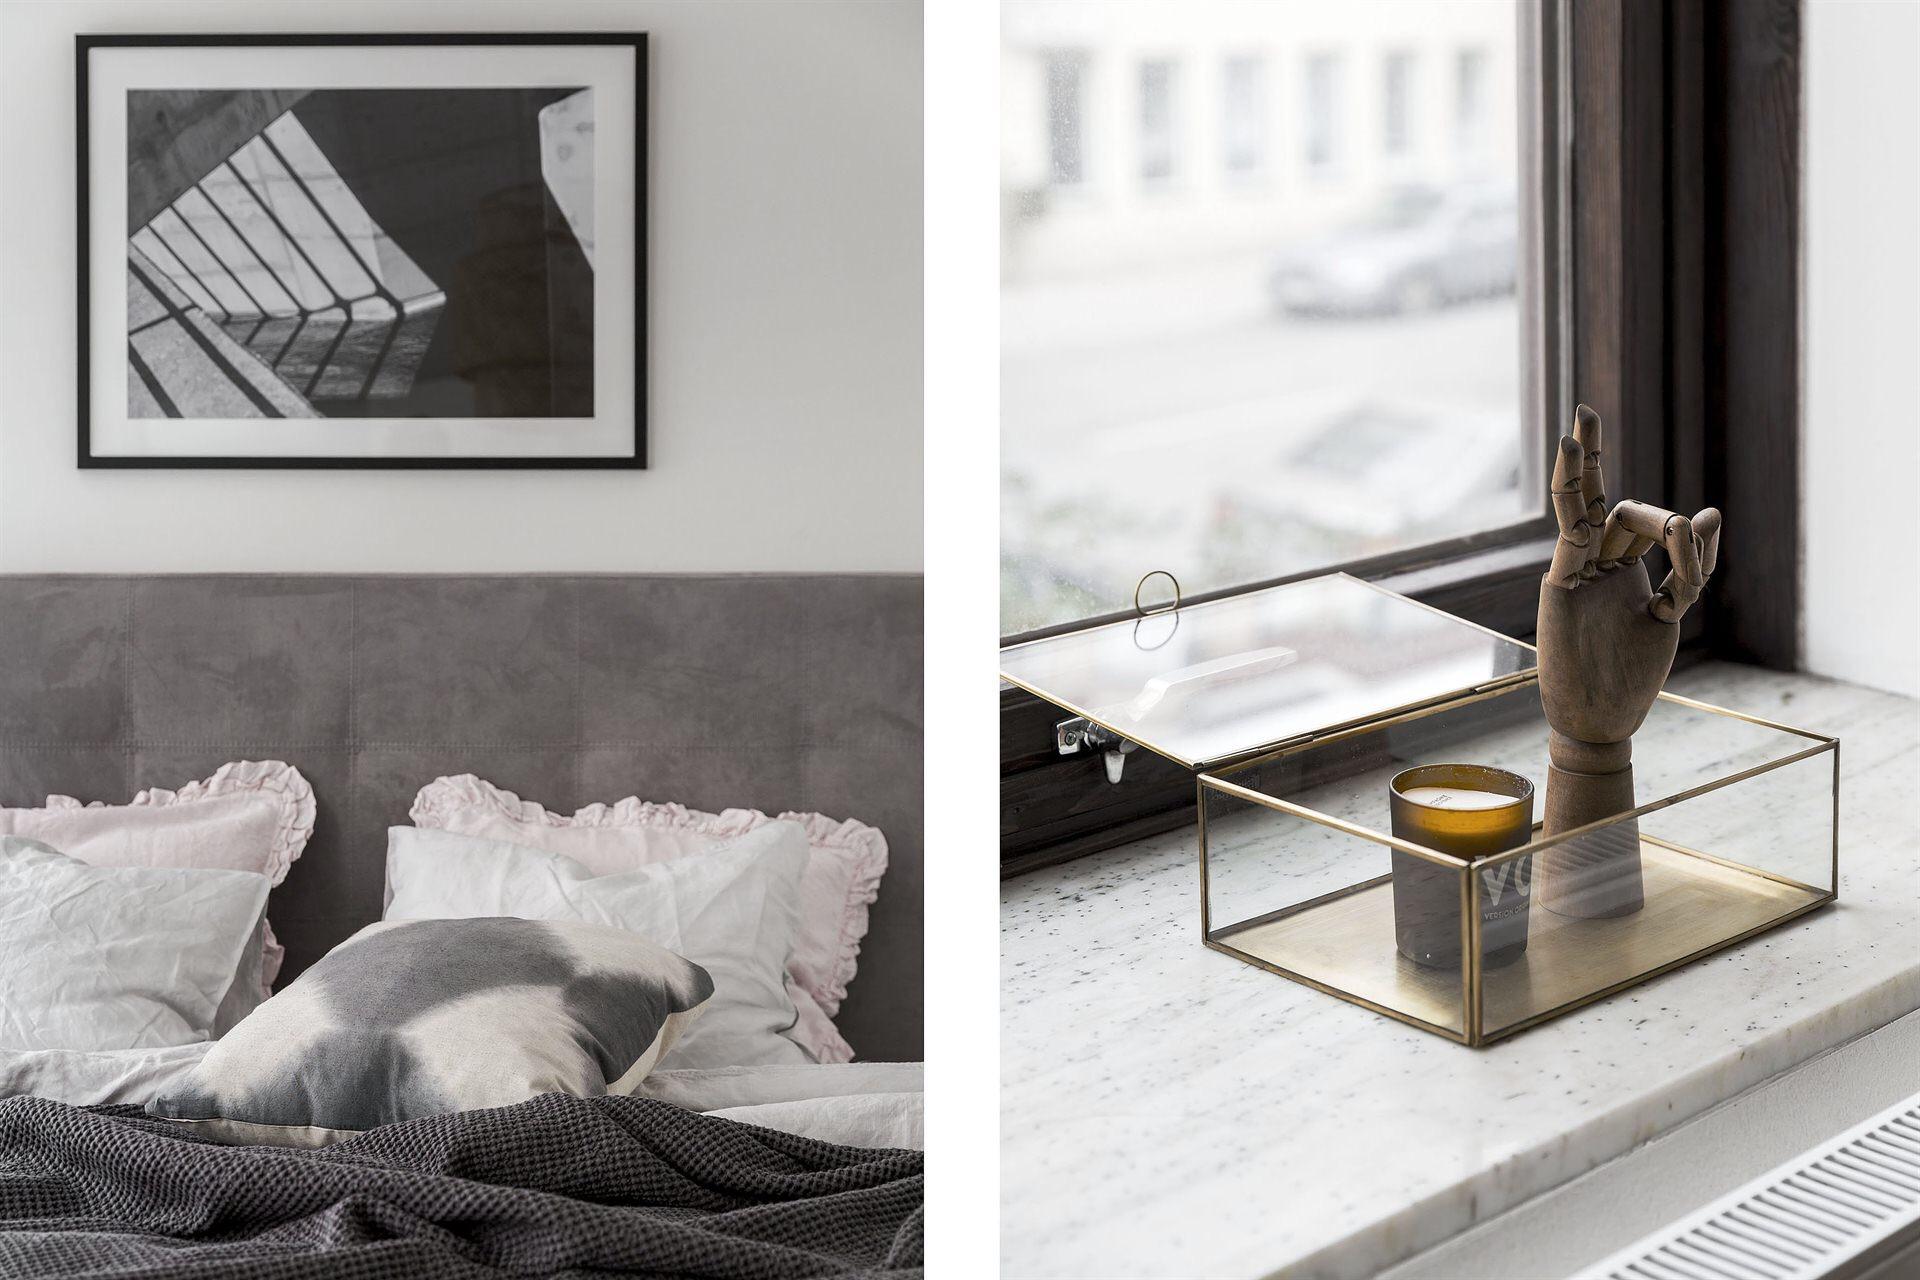 диван подушки окно подоконник стеклянная шкатулка